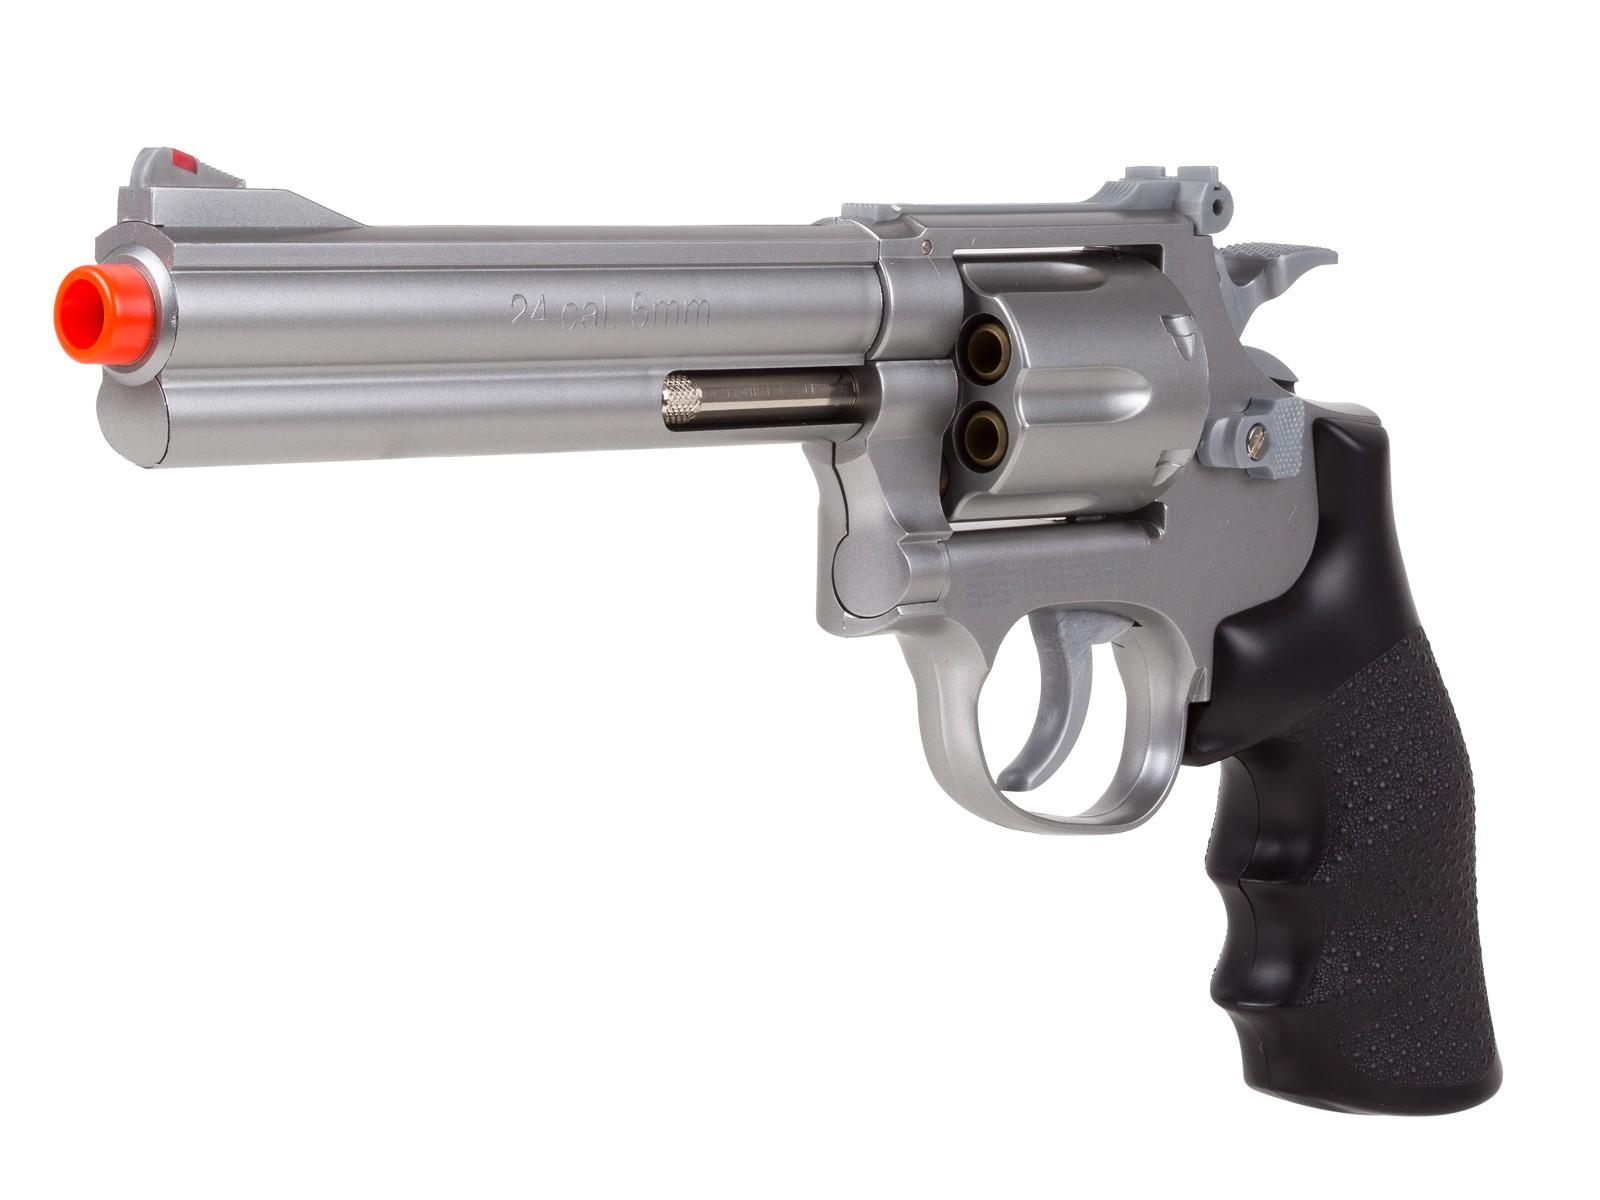 TSD_Sports_Airsoft_Spring_Revolver__6_Barrel_SilverBlack_6mm